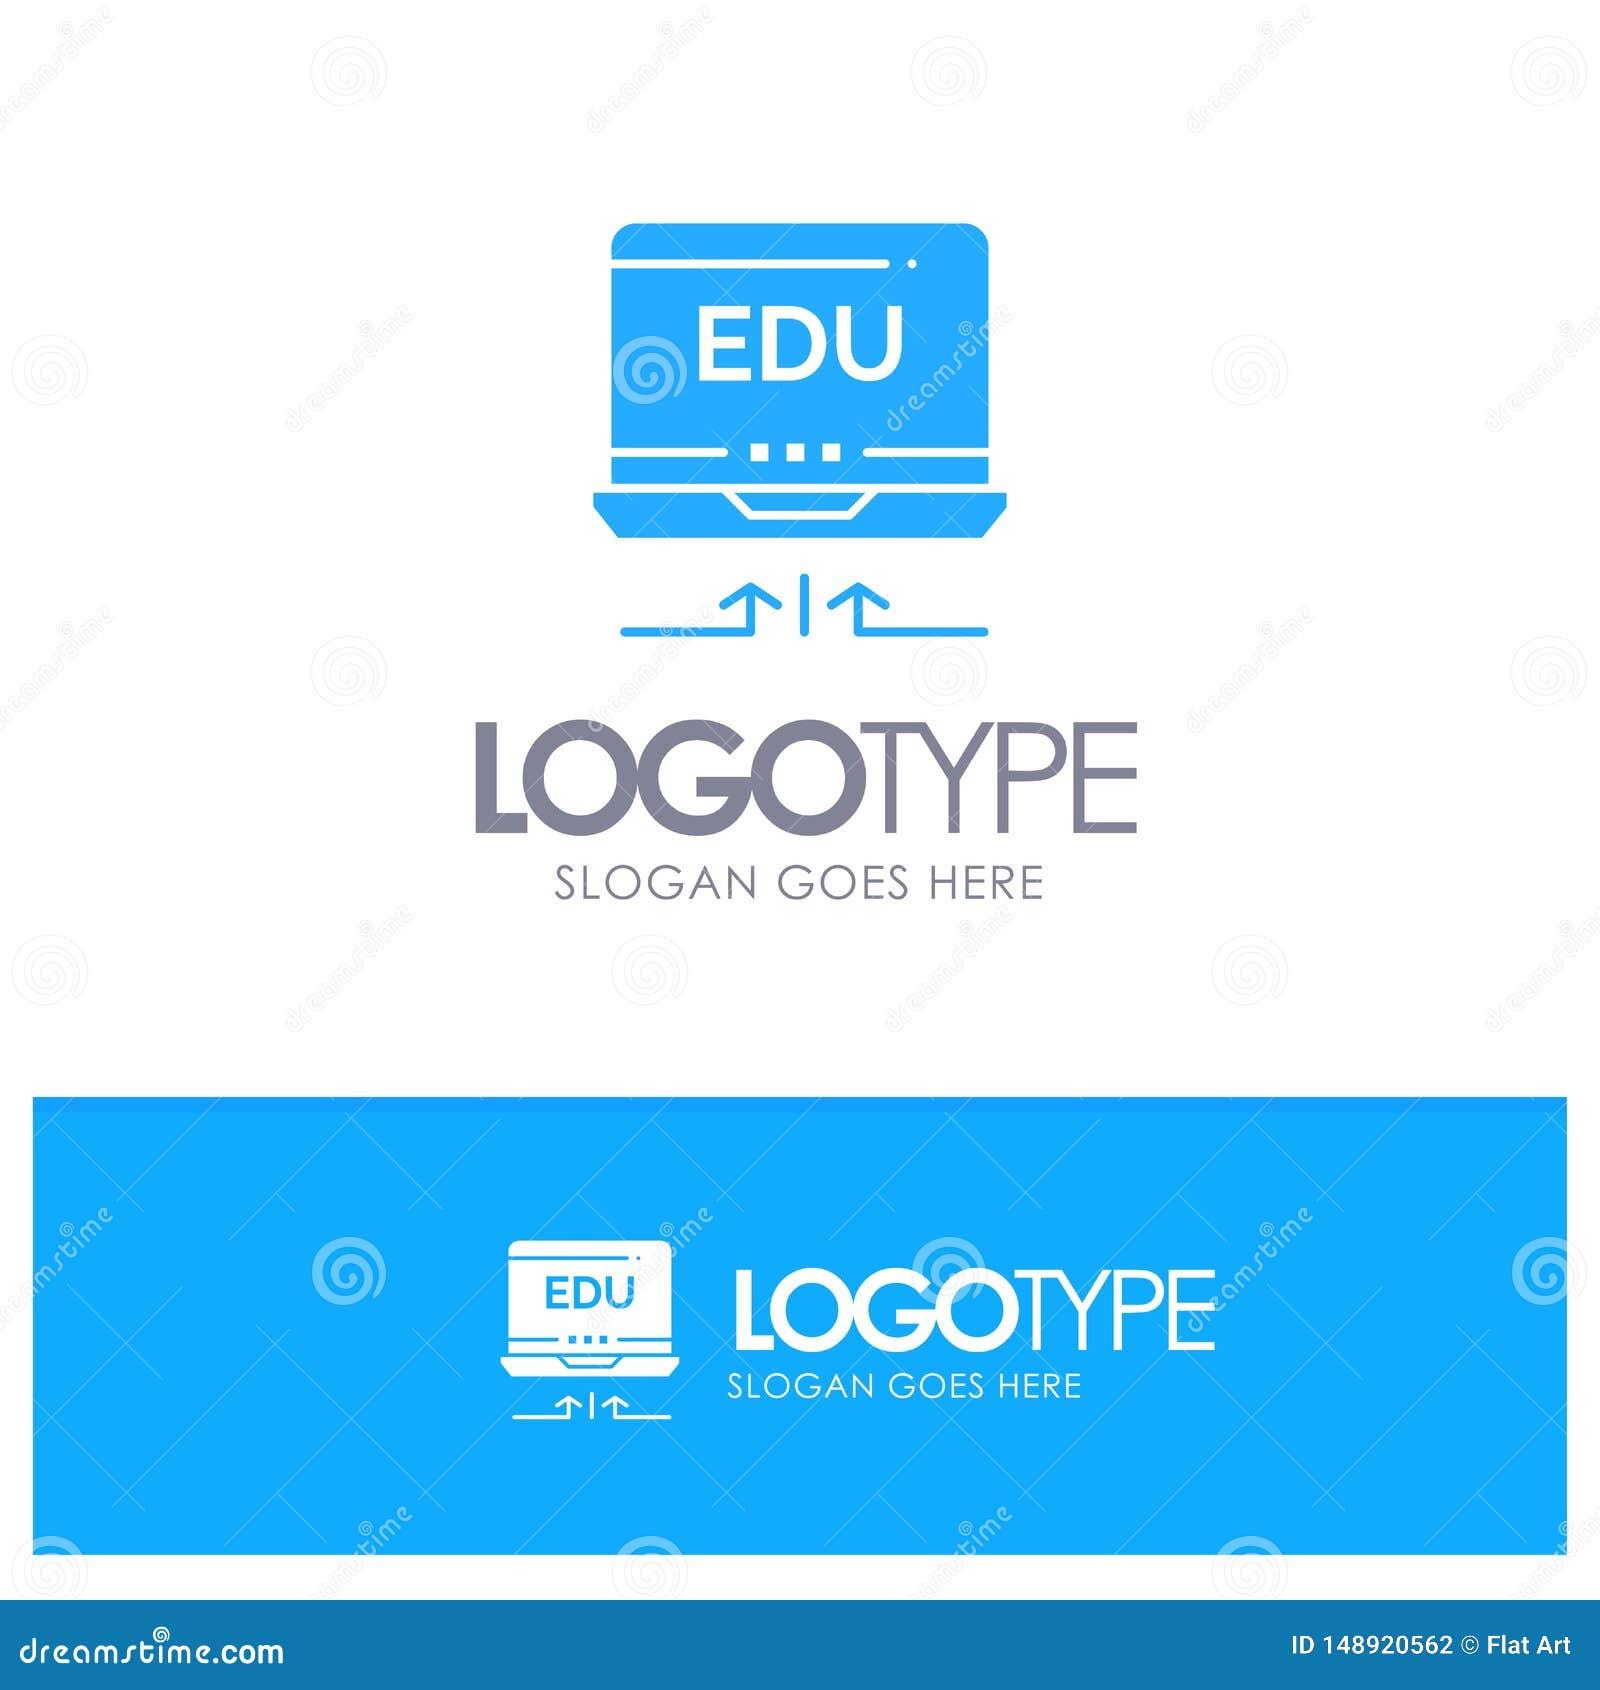 Laptop, Hardware, Arrow, Education Blue Logo vector